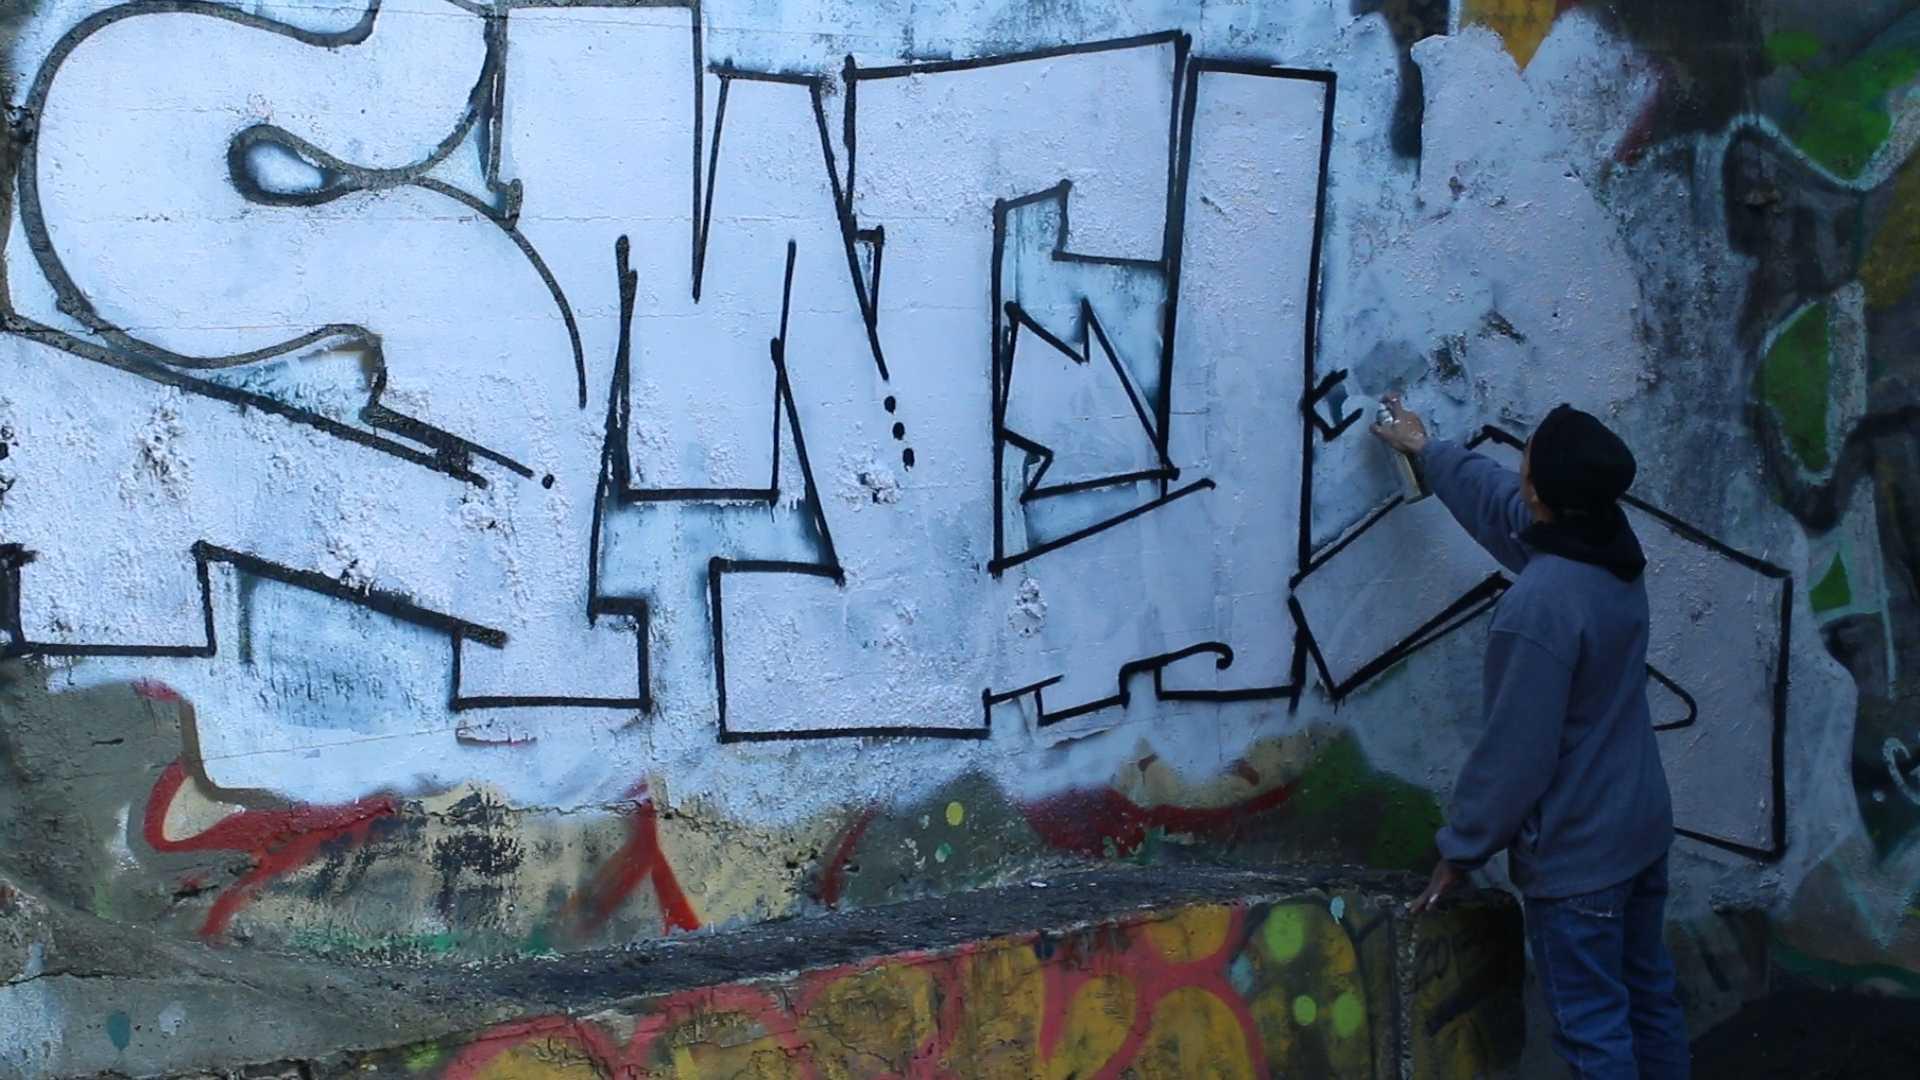 Graffiti artists define the line between art and vandalism